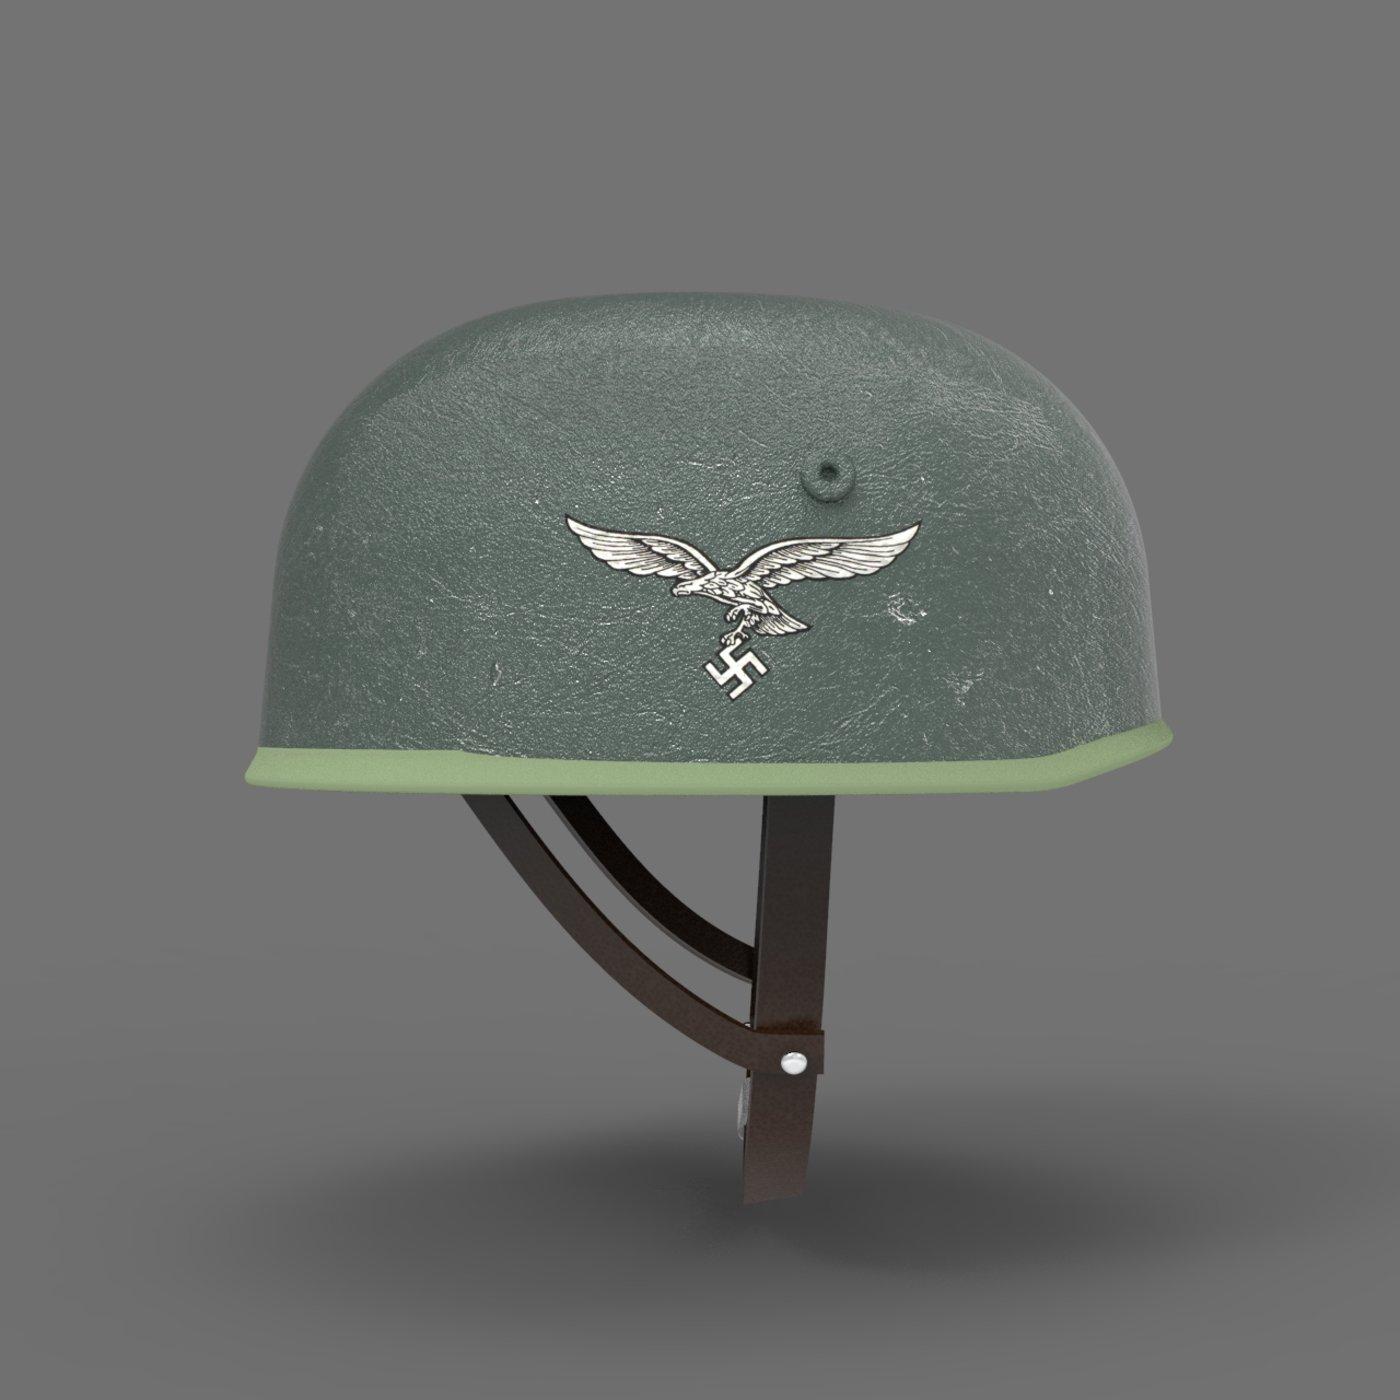 WWII German Paratrooper Helmet